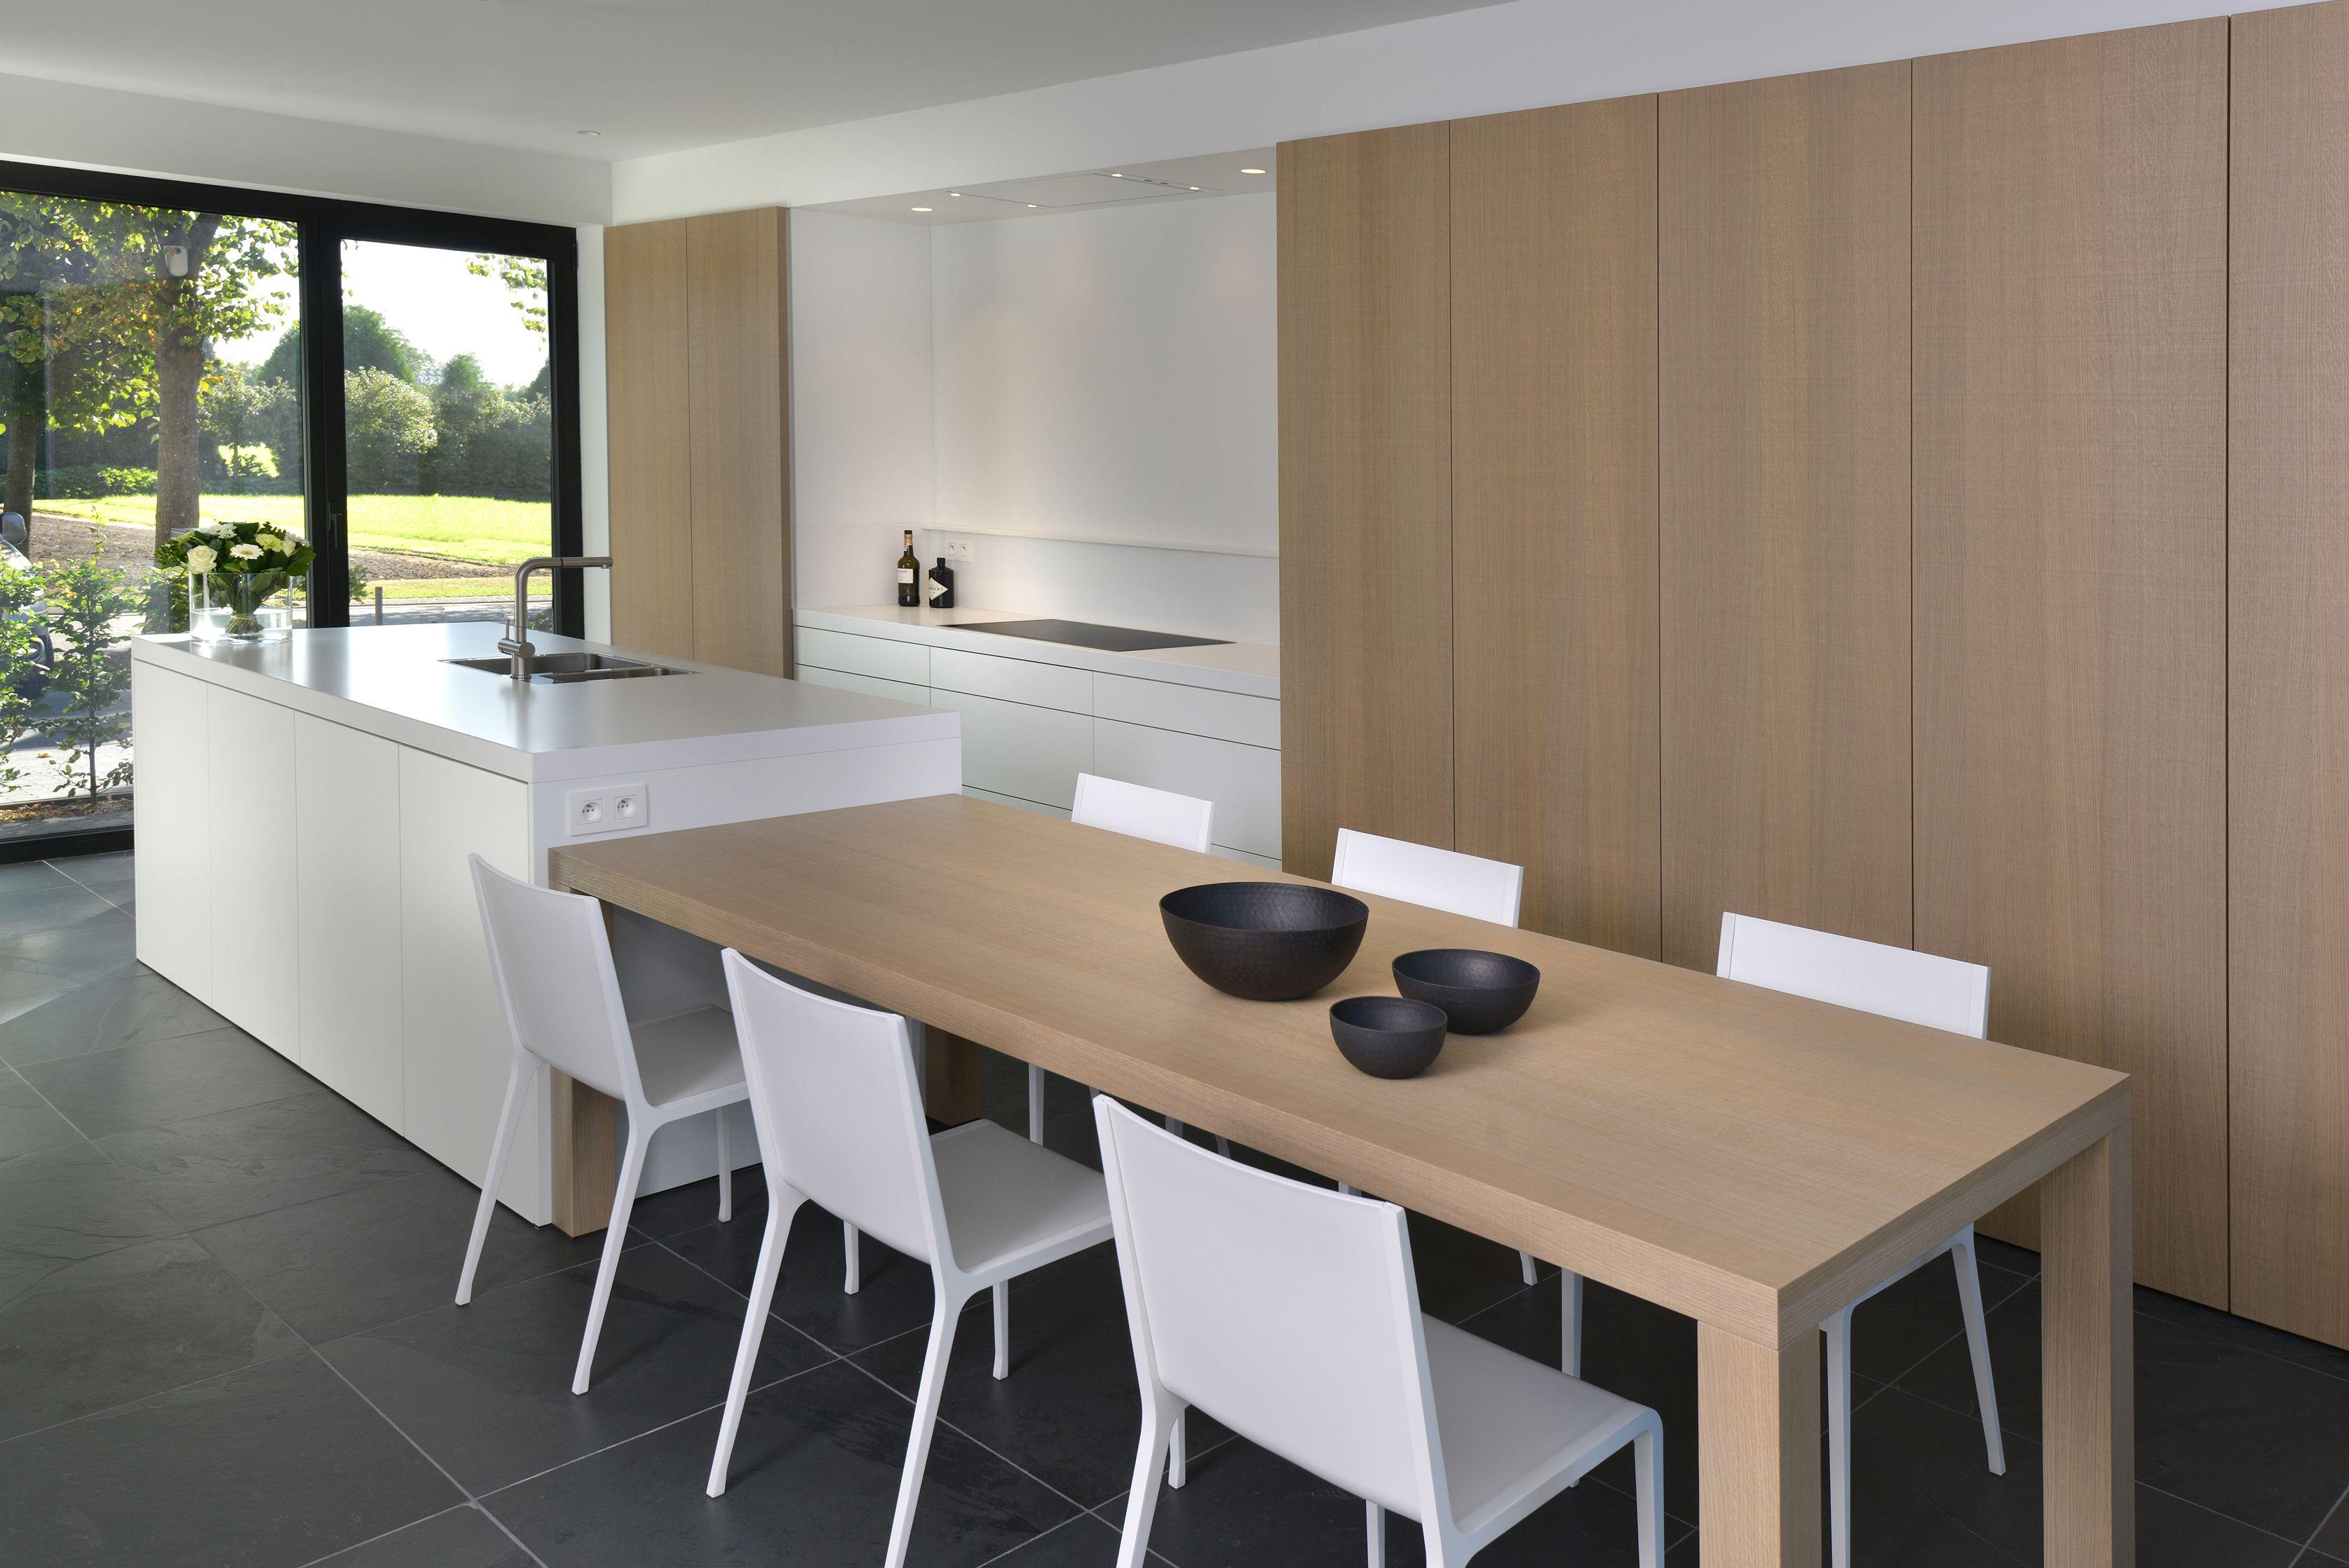 Moderne Witte Keukens : Moderne witte keuken gecombineerd met hout strakke keukens